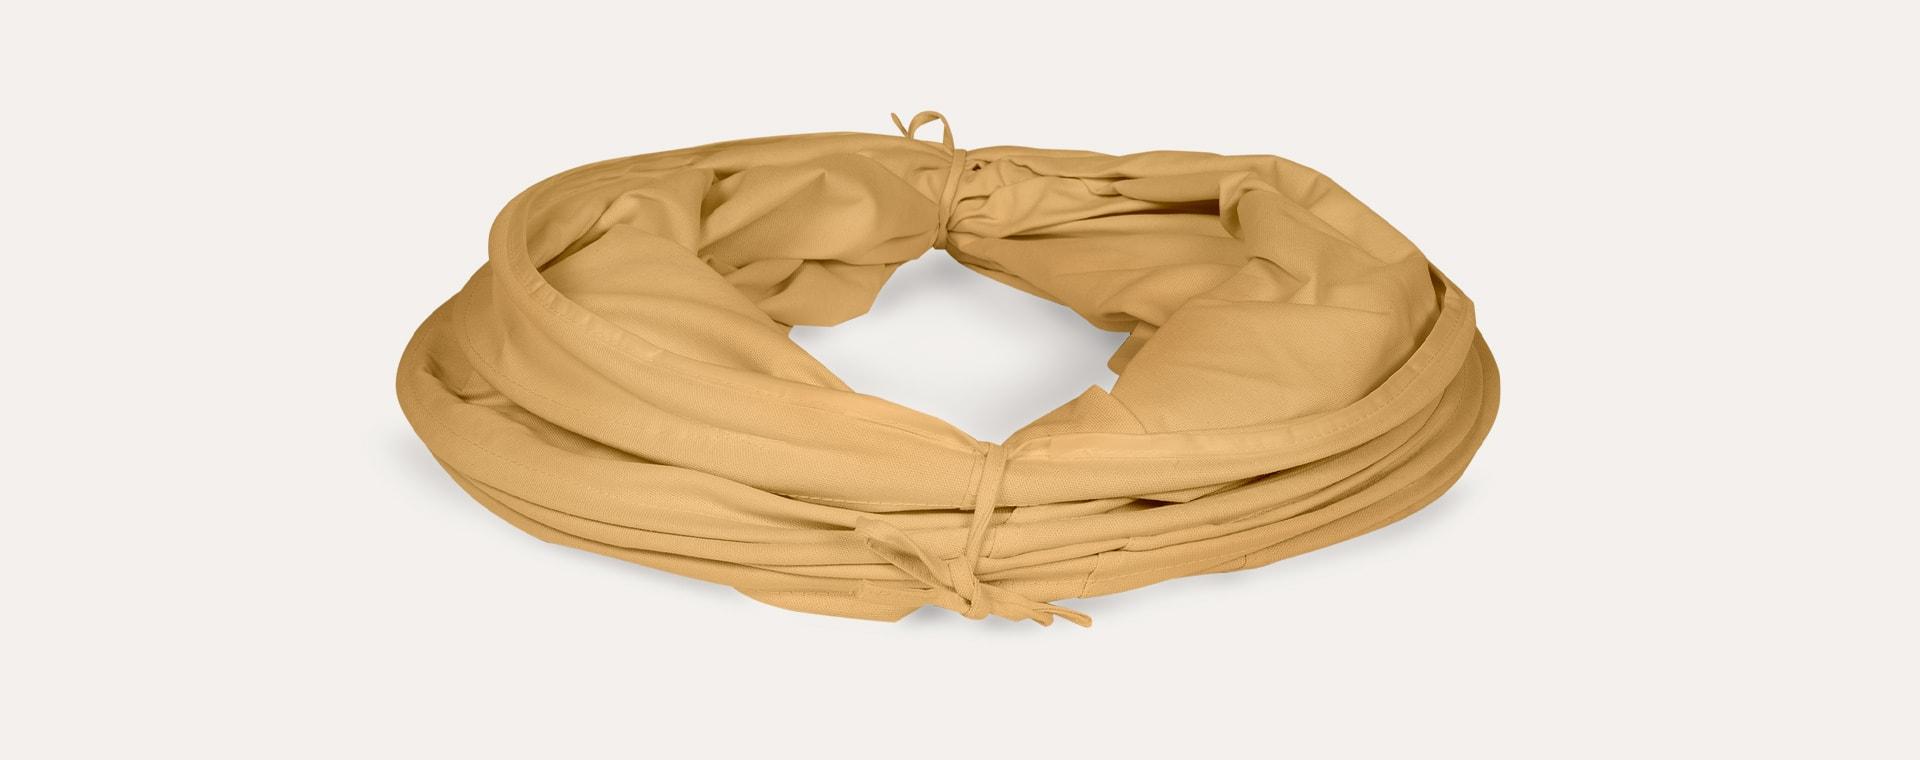 Mustard Kid's Concept Cotton Play Tunnel